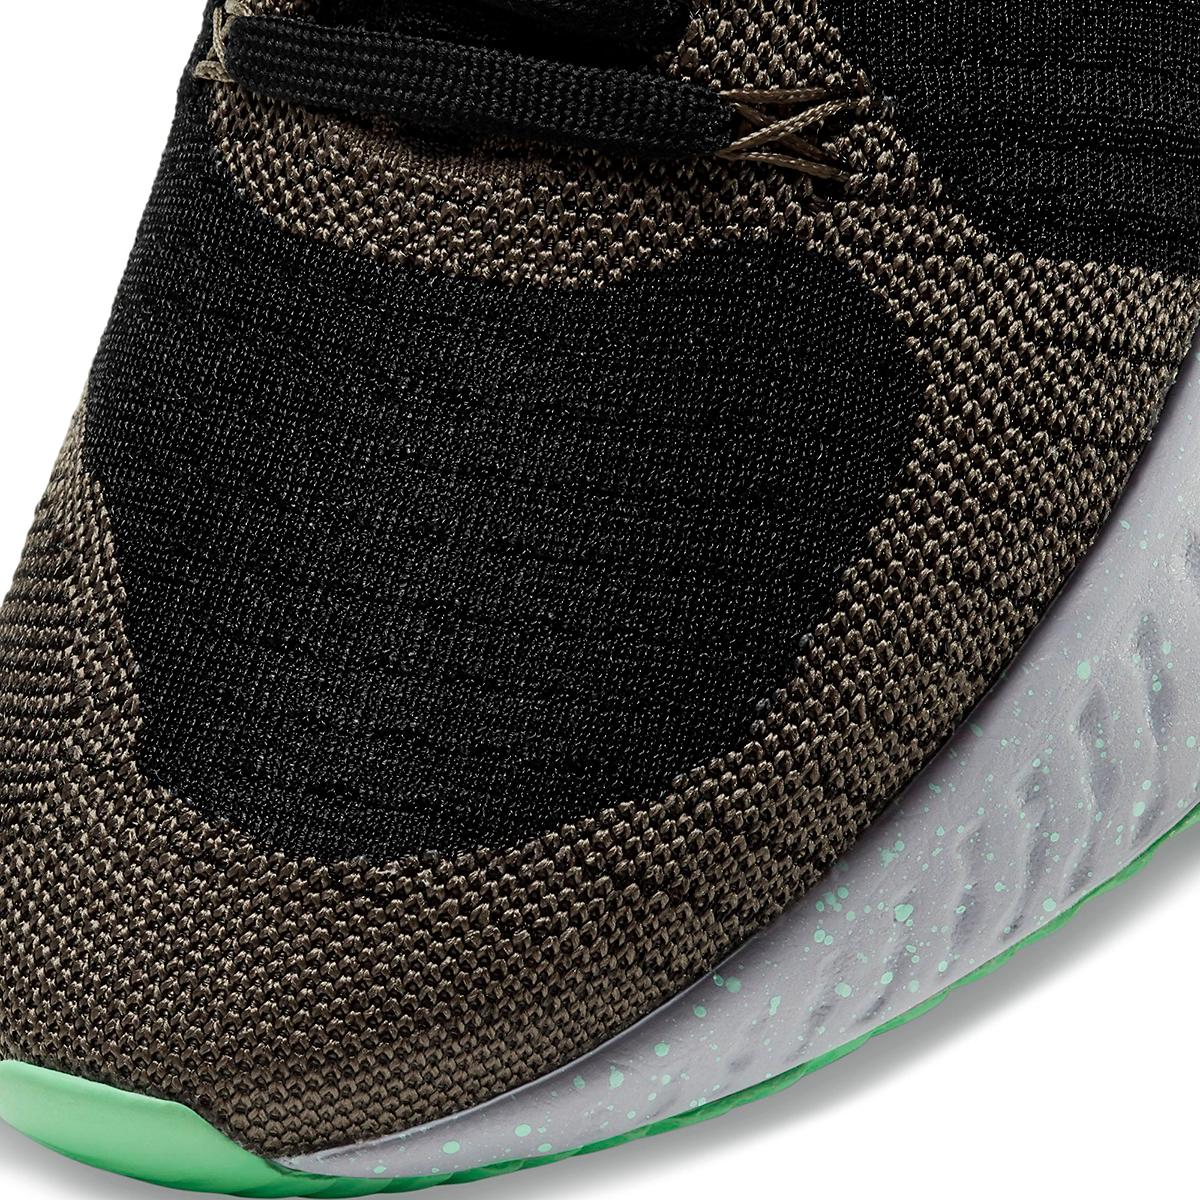 Men's Nike React Infinity Run Flyknit 2 Running Shoe - Color: Ridgerock/Chile Red/Black/Green Glow - Size: 6 - Width: Regular, Ridgerock/Chile Red/Black/Green Glow, large, image 7